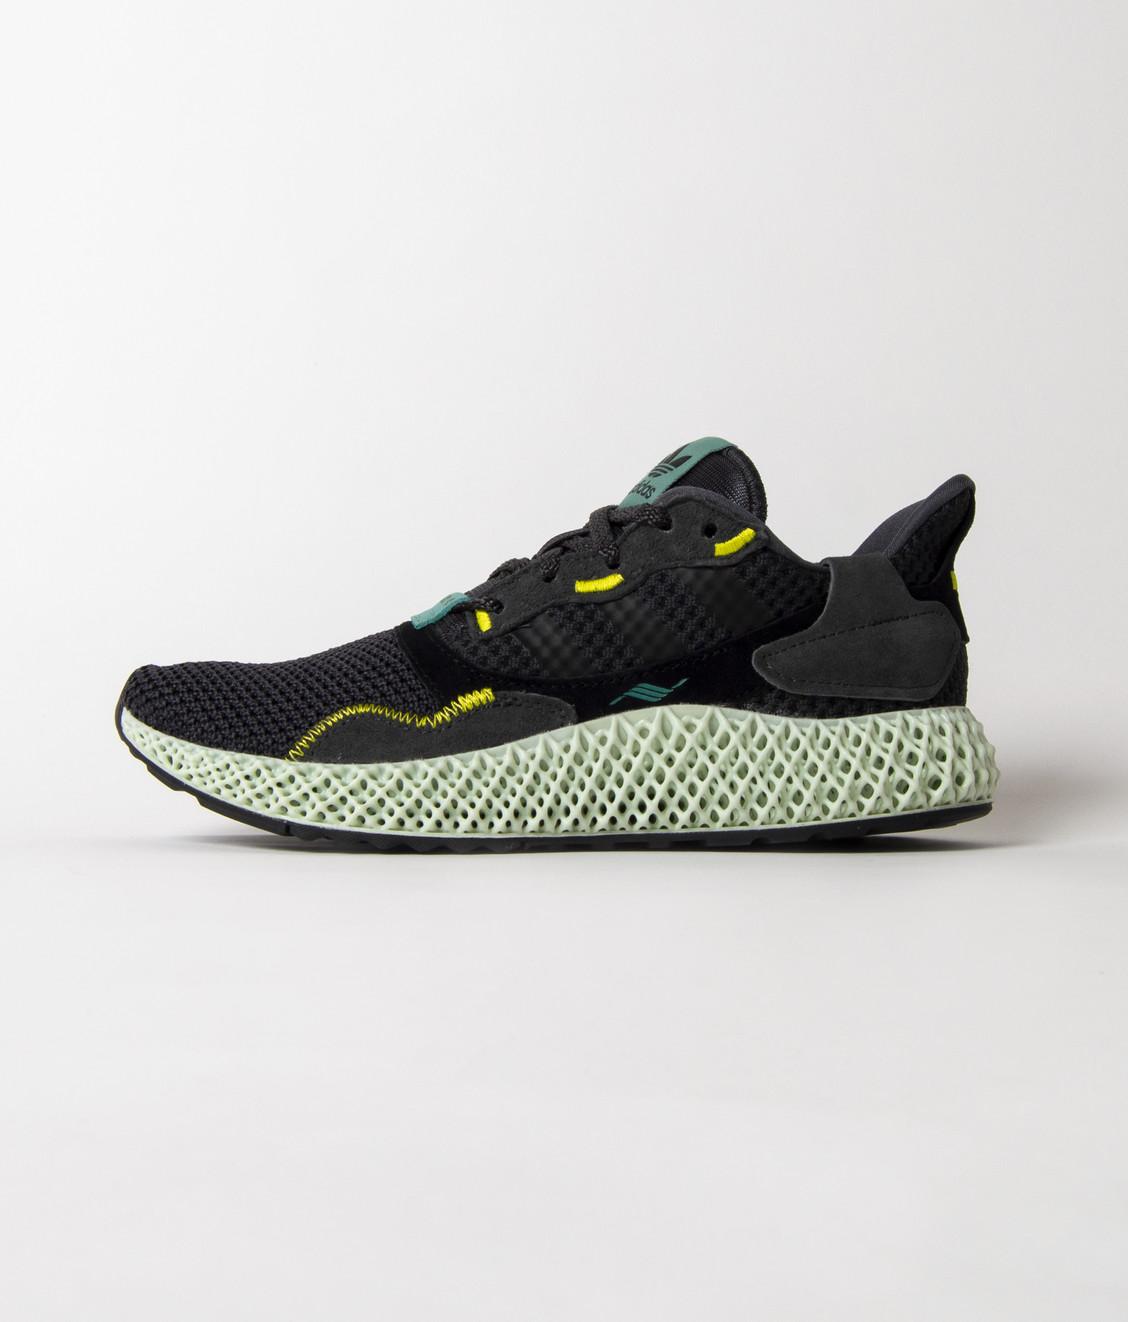 Adidas Adidas ZX 4000 4D Carbon Carbon